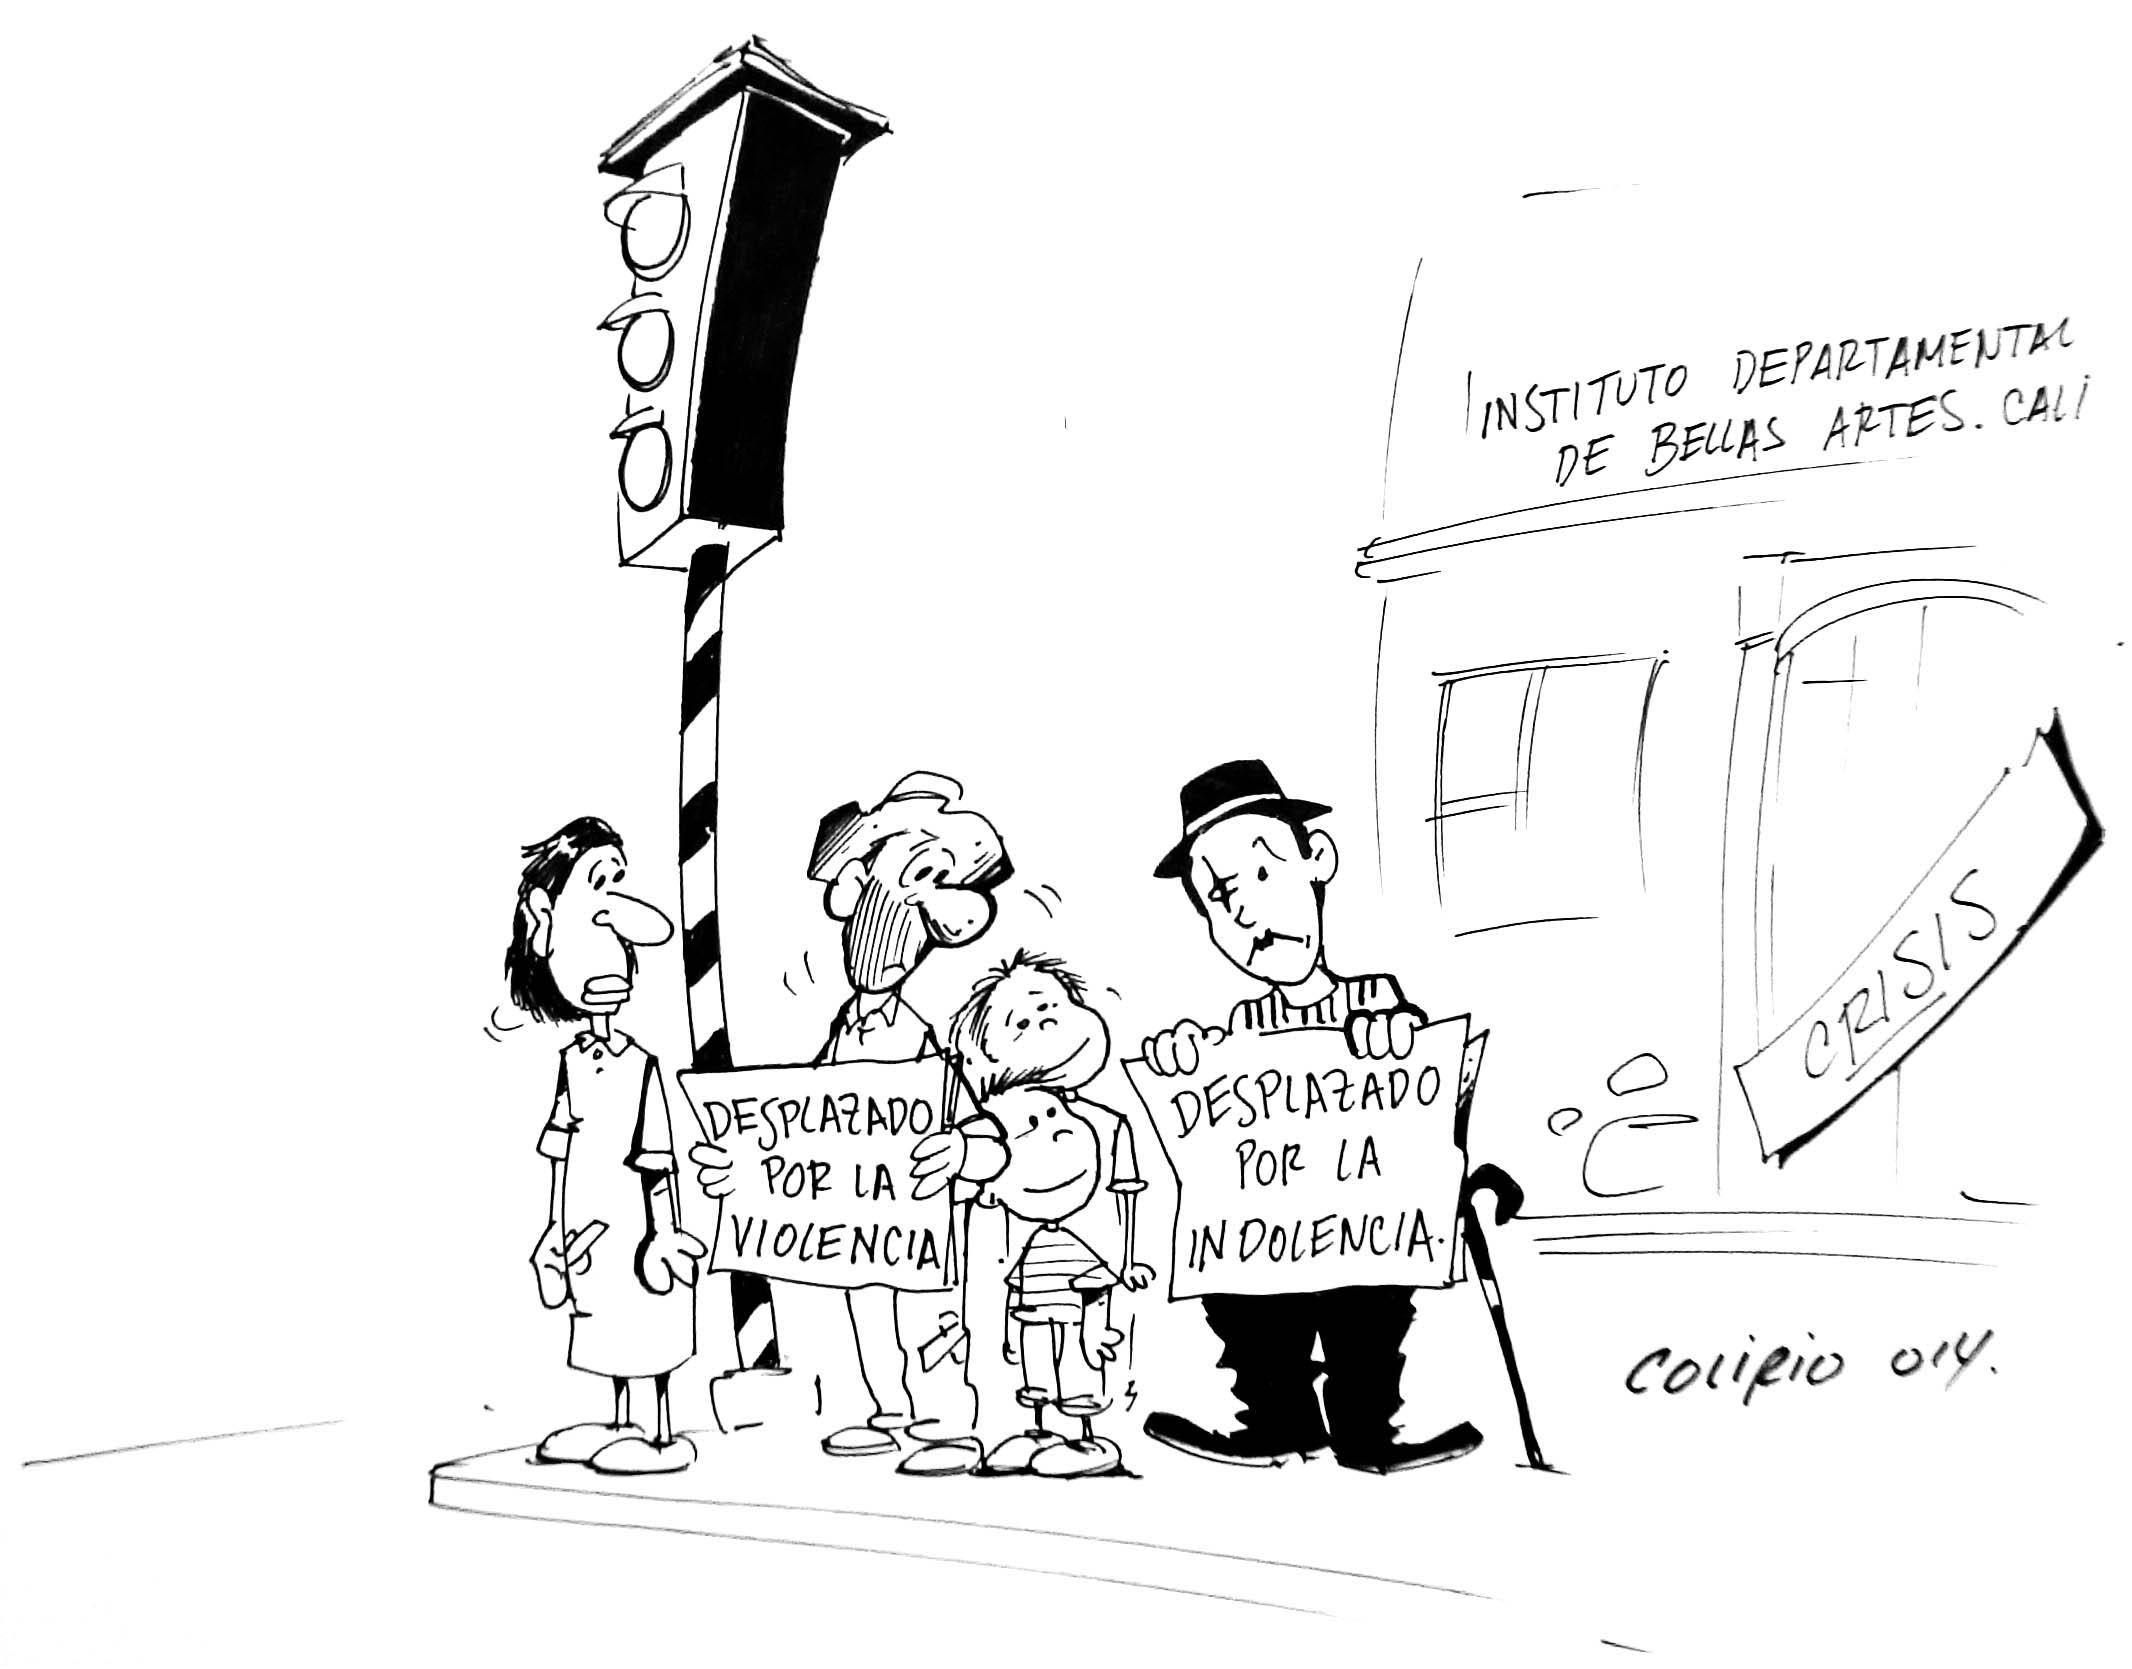 carica sabado 22 de agosto de 2014